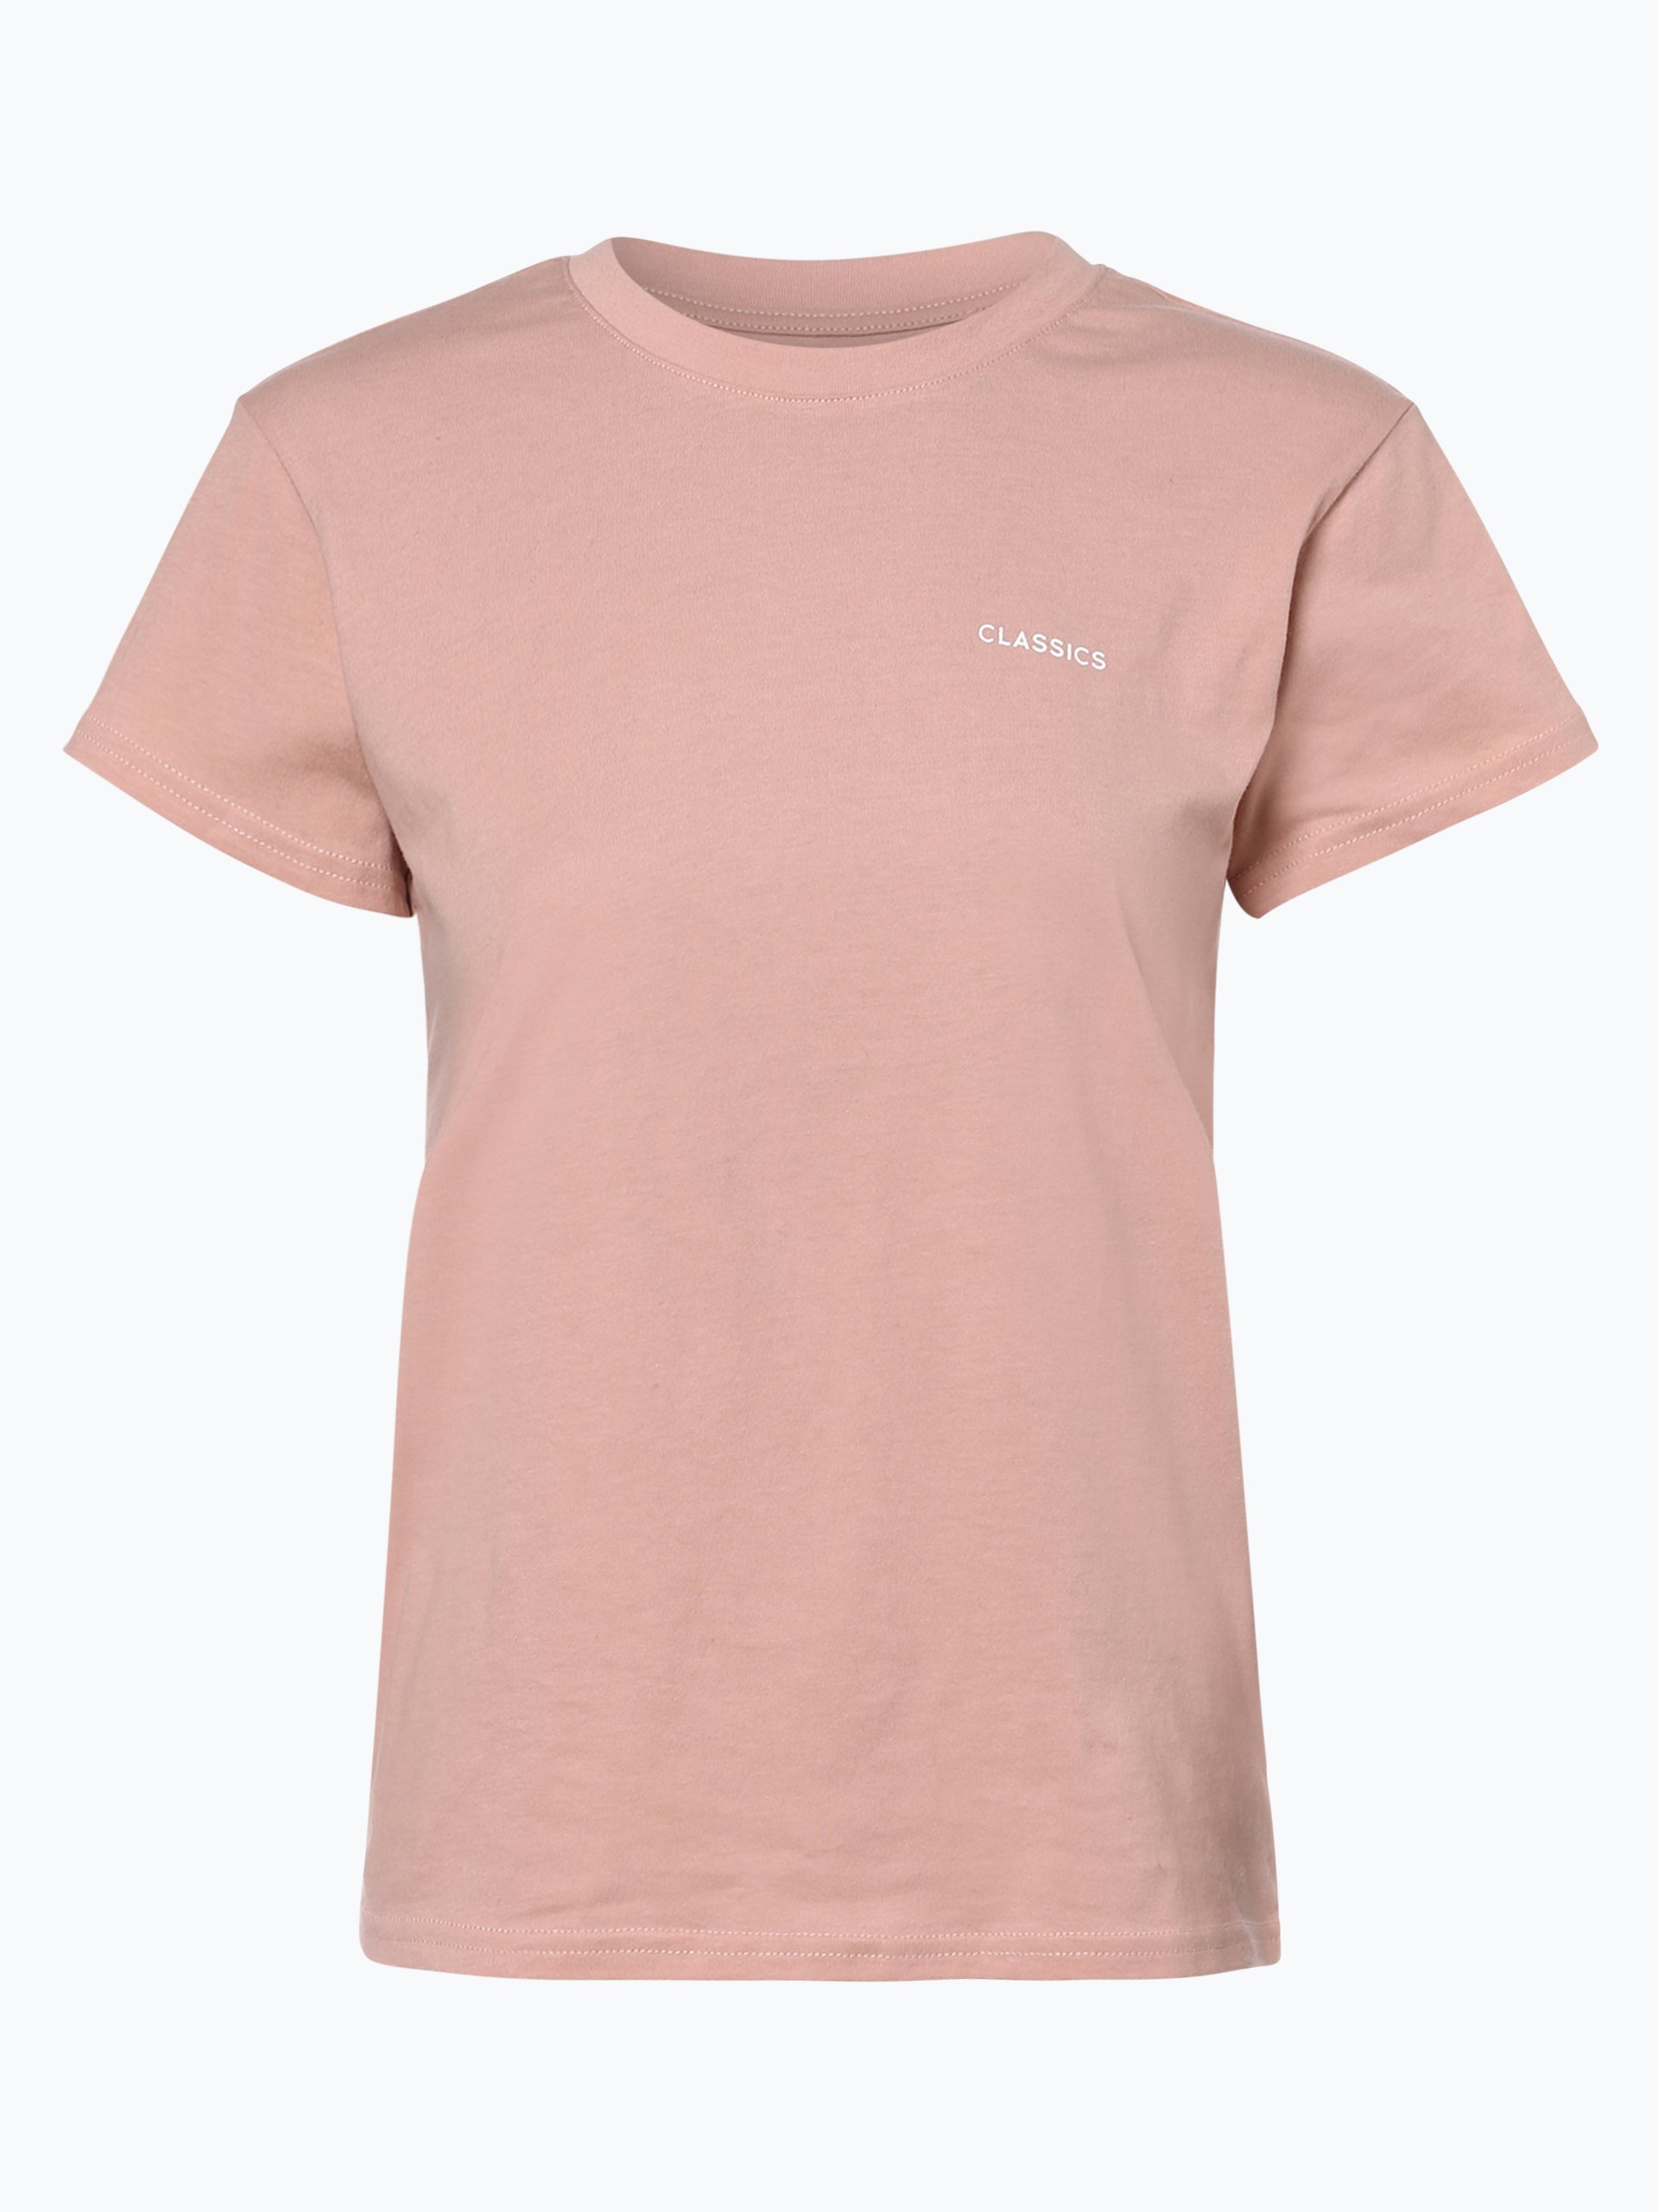 review damen t shirt kaufen peek und cloppenburg de